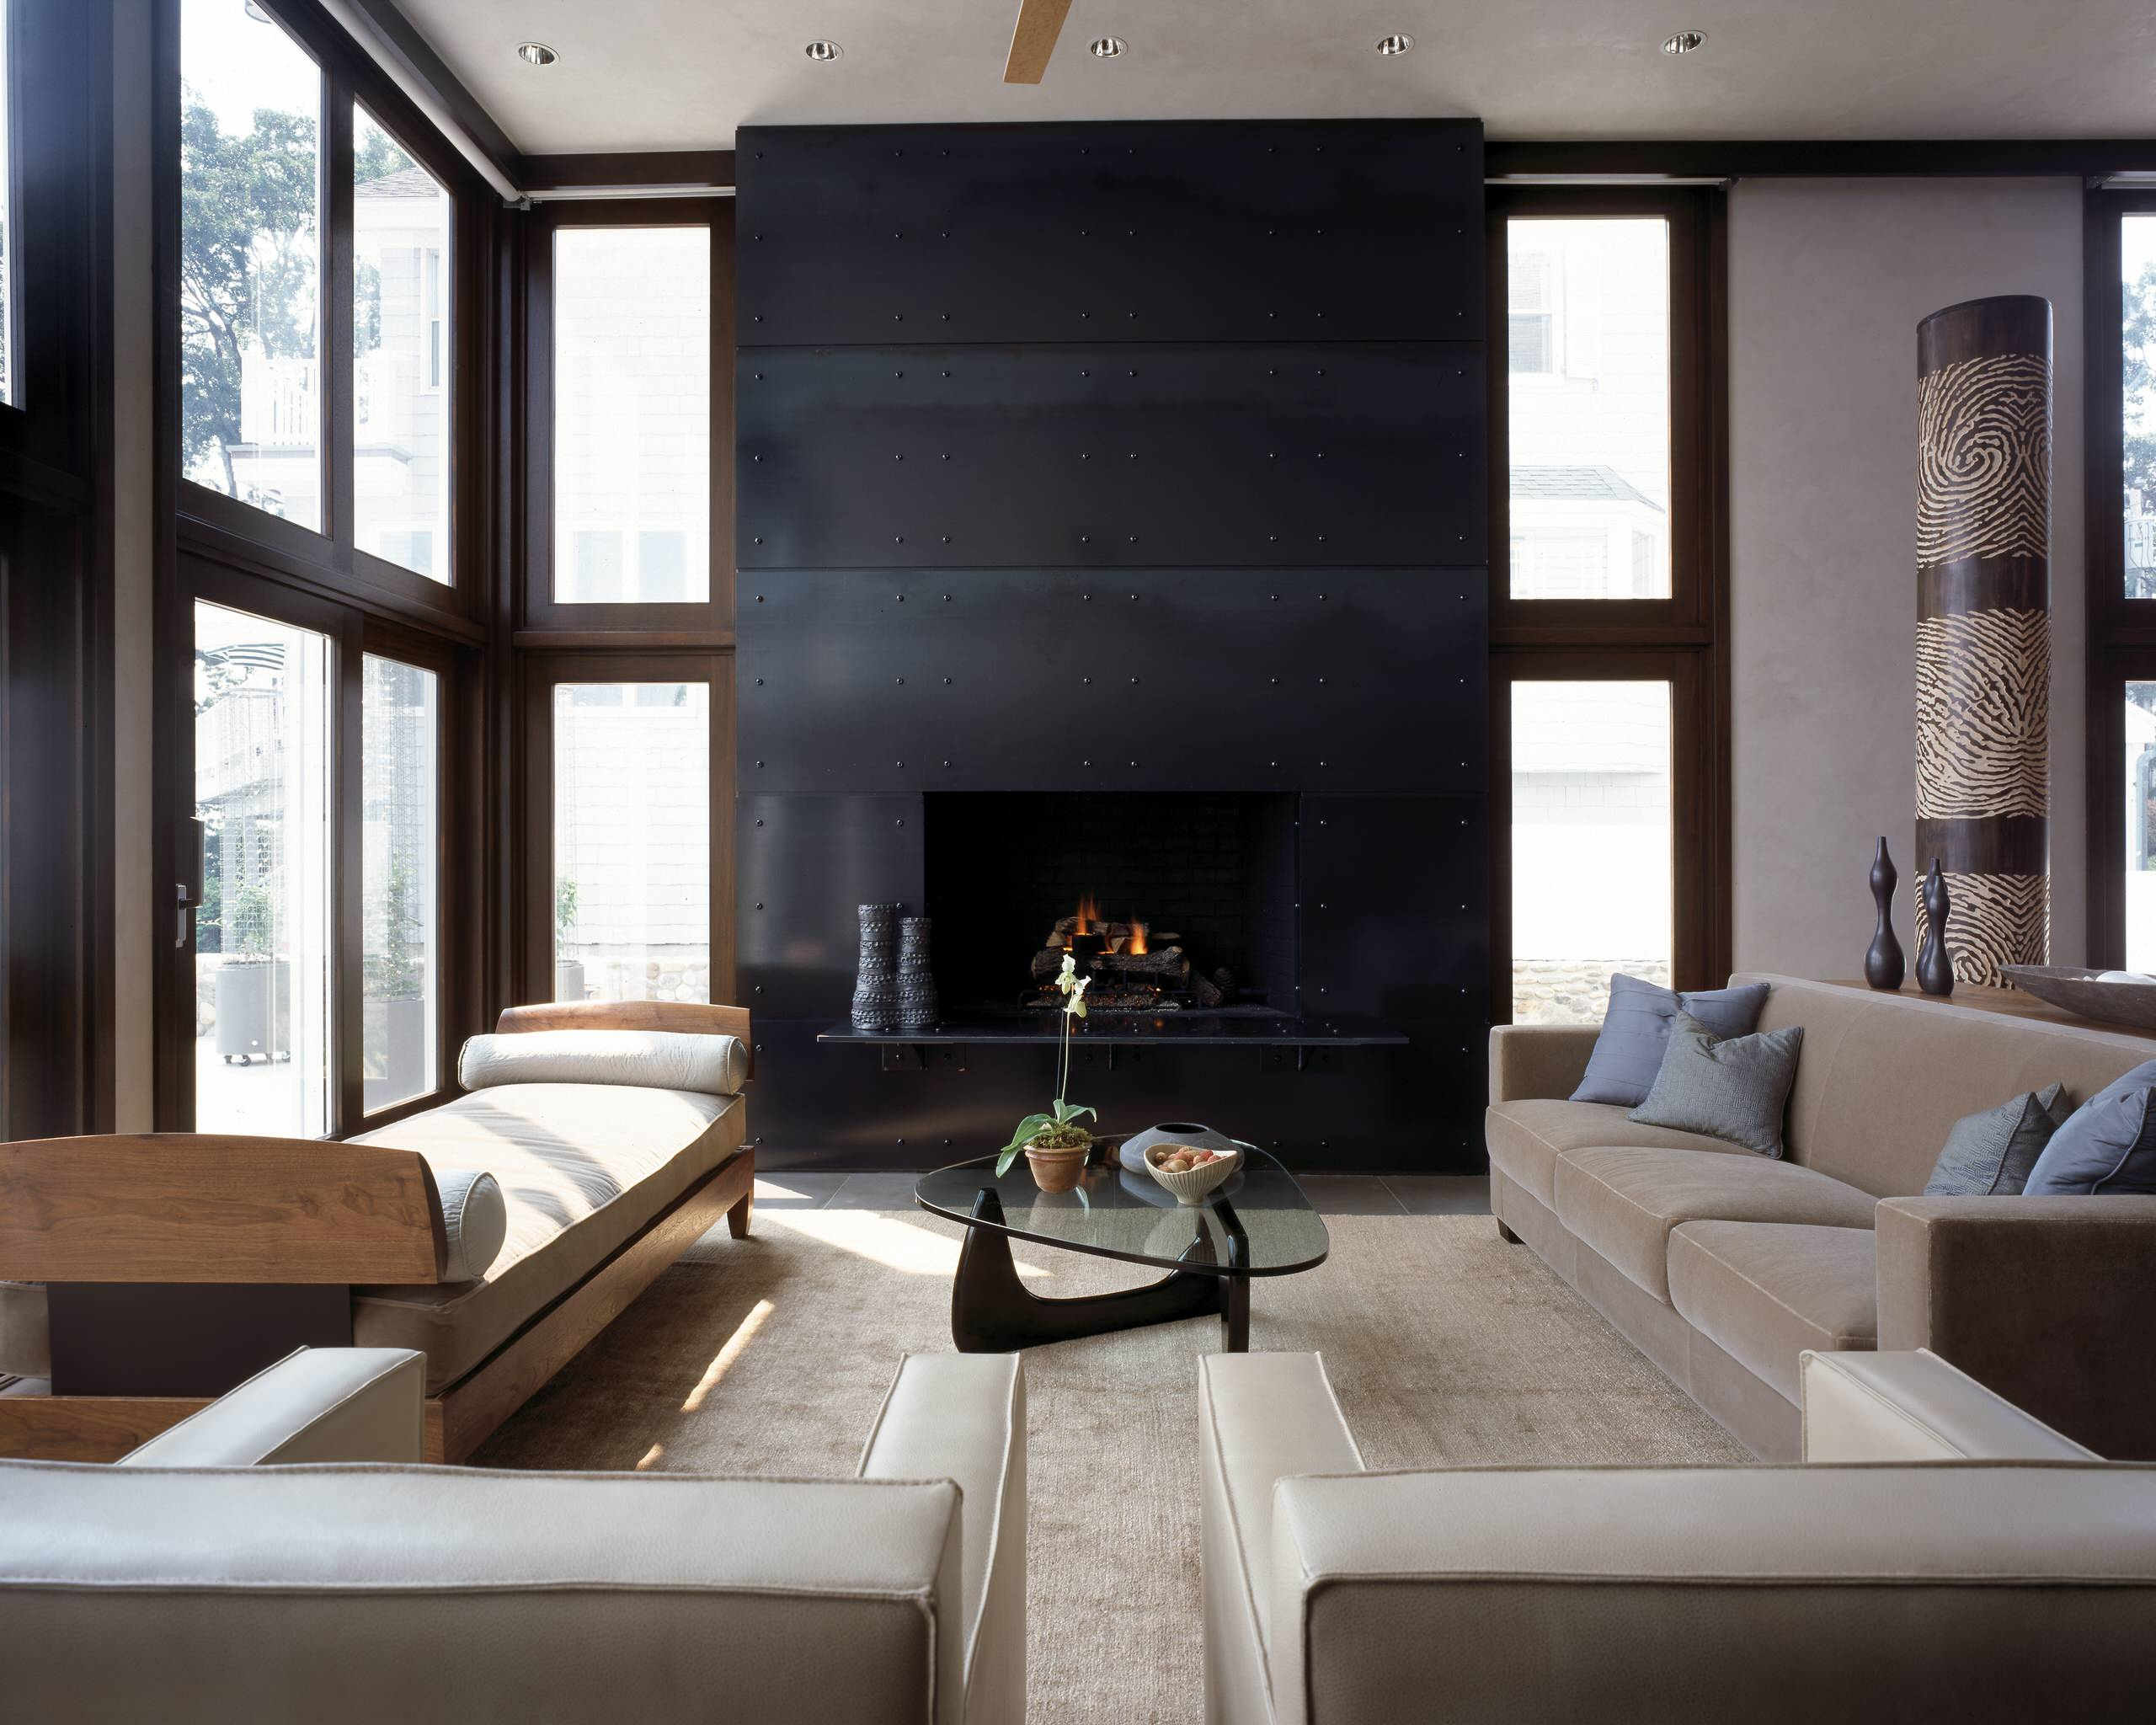 Blackened Steel Fireplace Surround Houzz, Black Steel Fireplace Surround